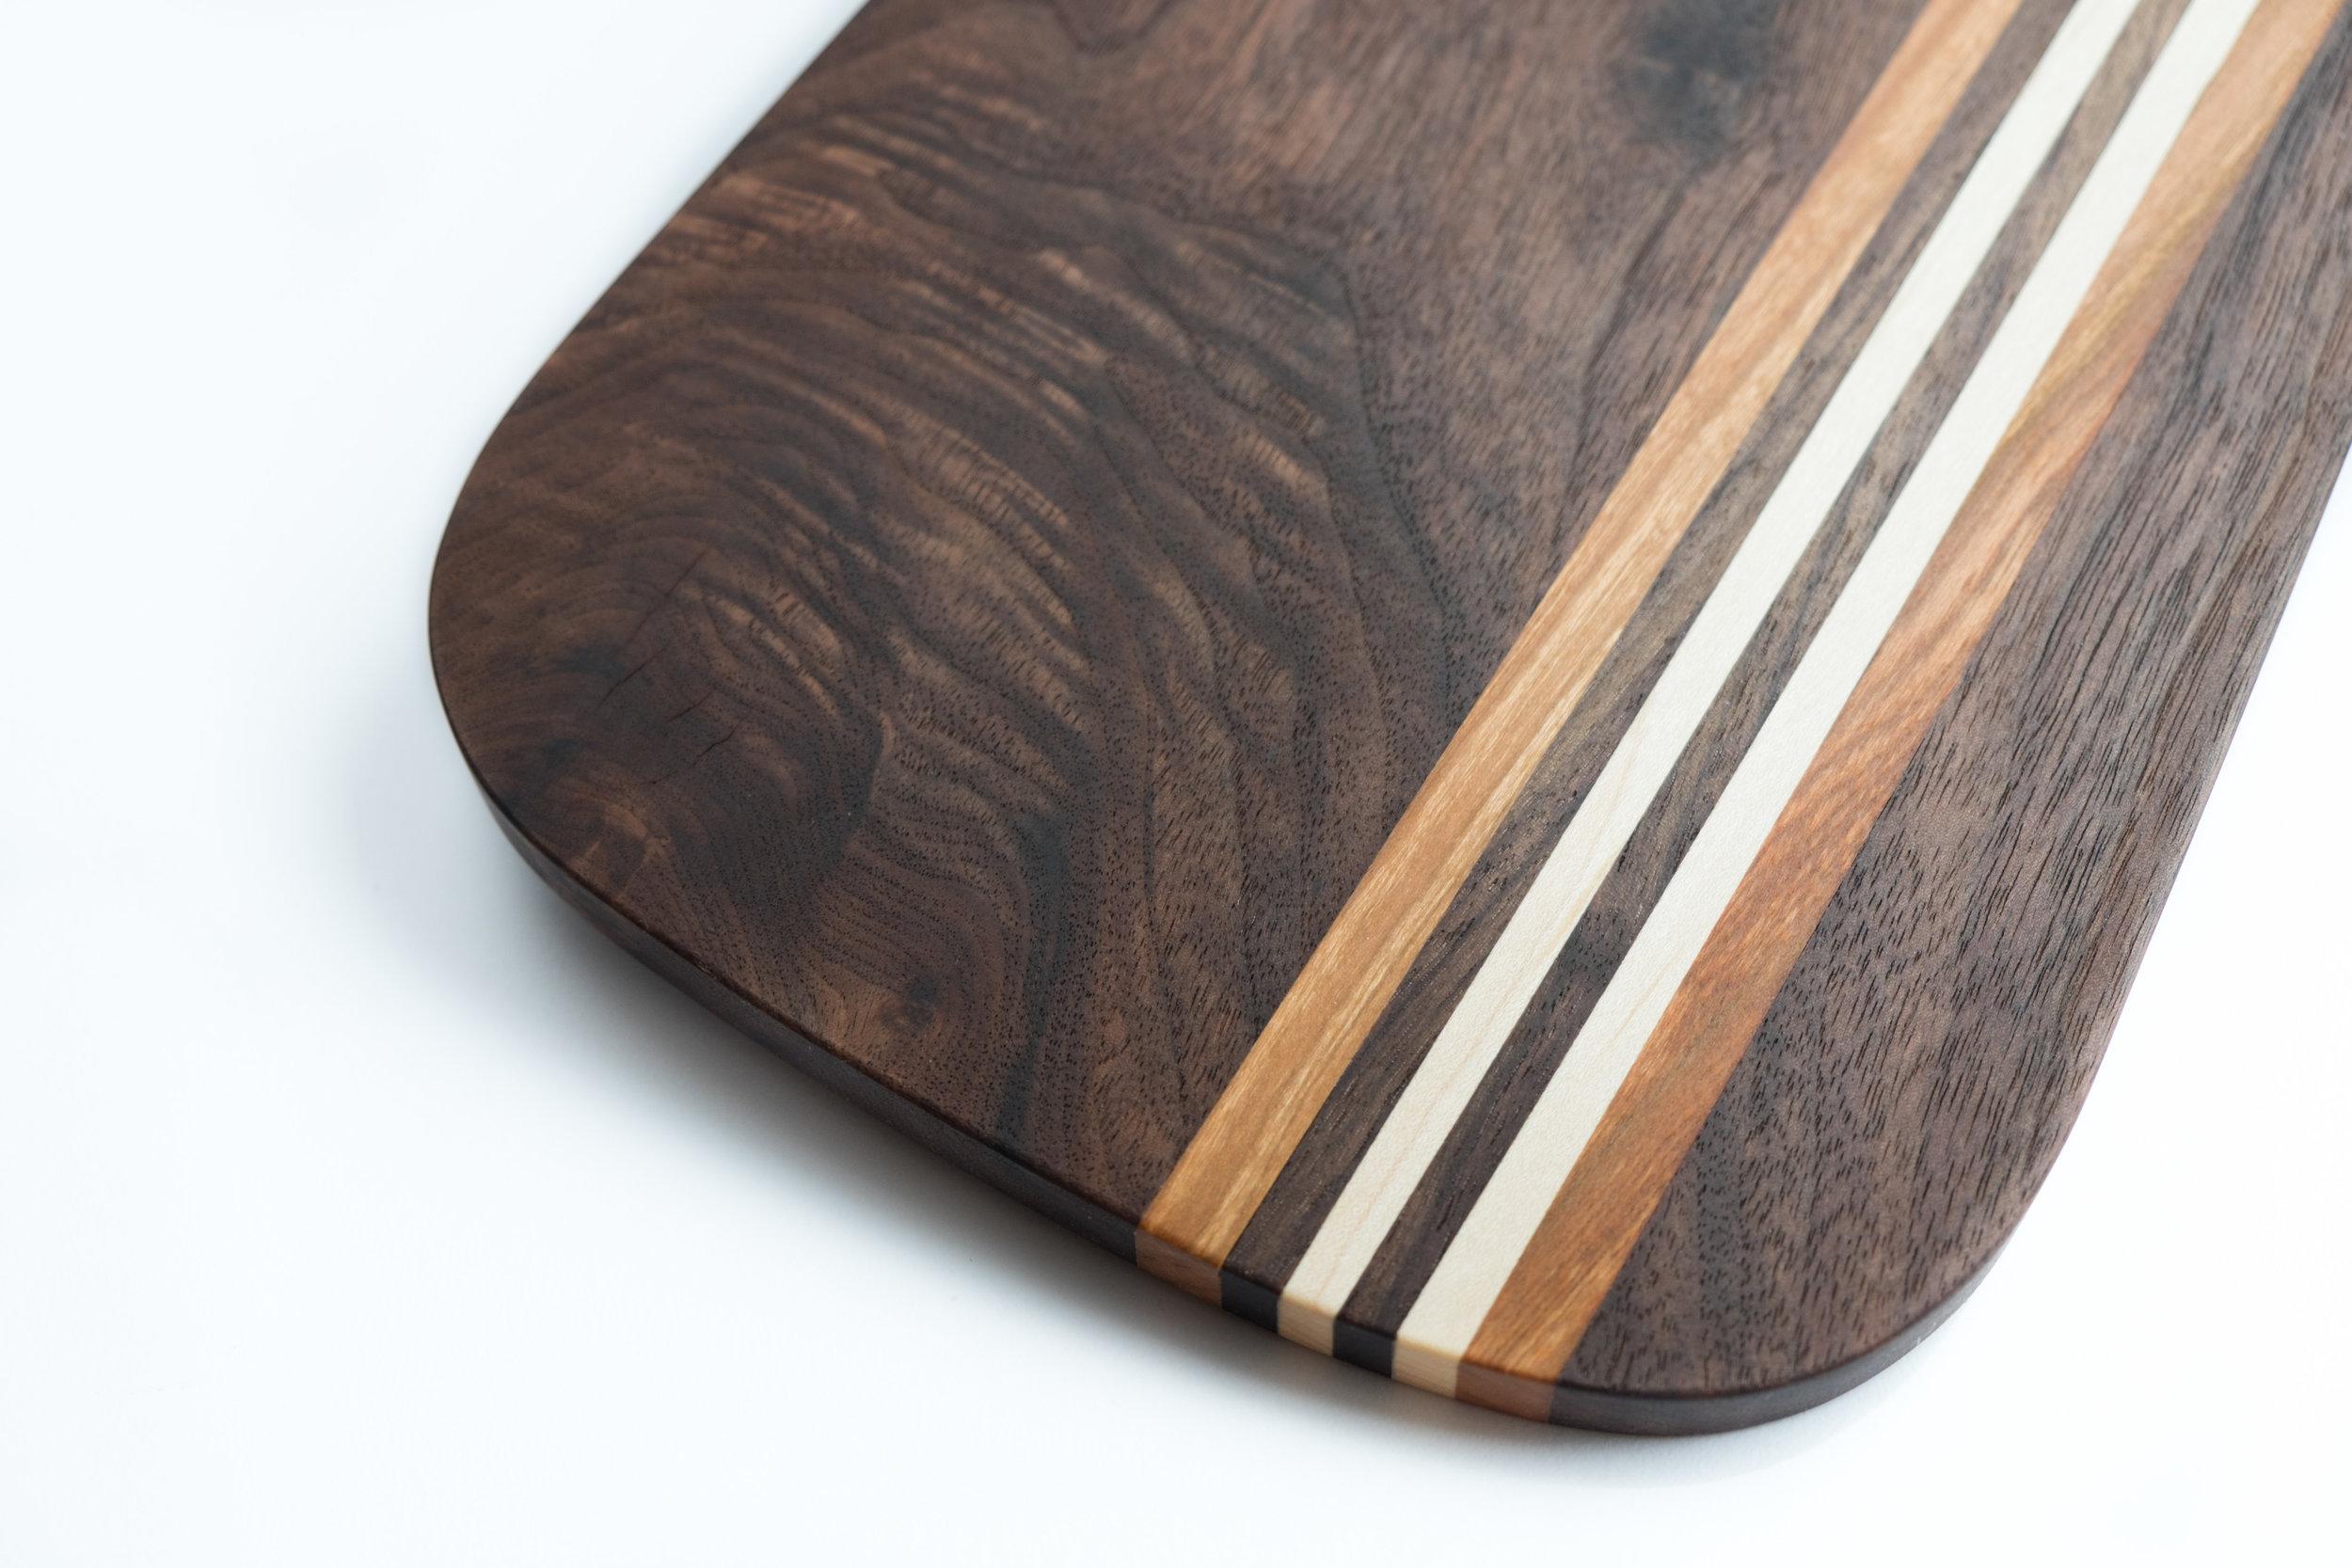 Walnut Breadboard Detail